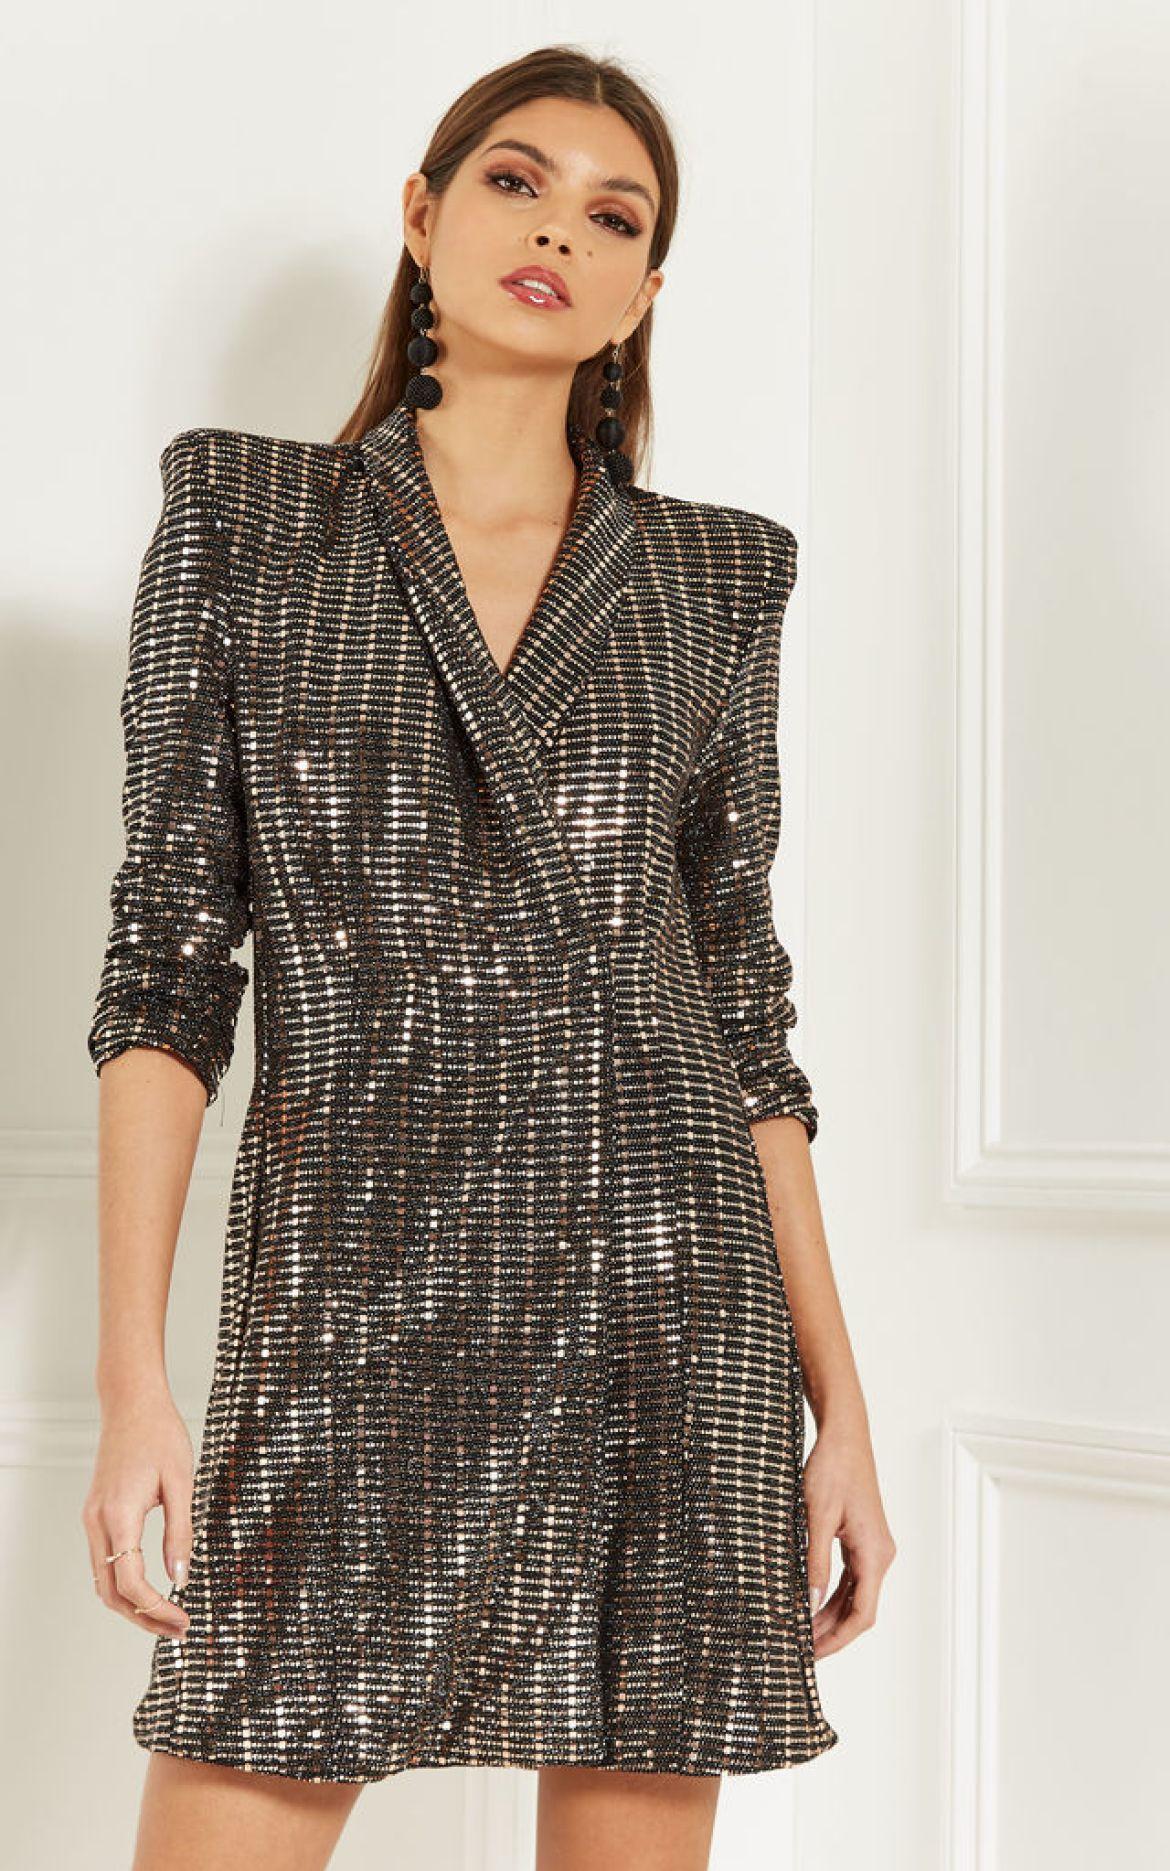 Sequin tuxedo dress